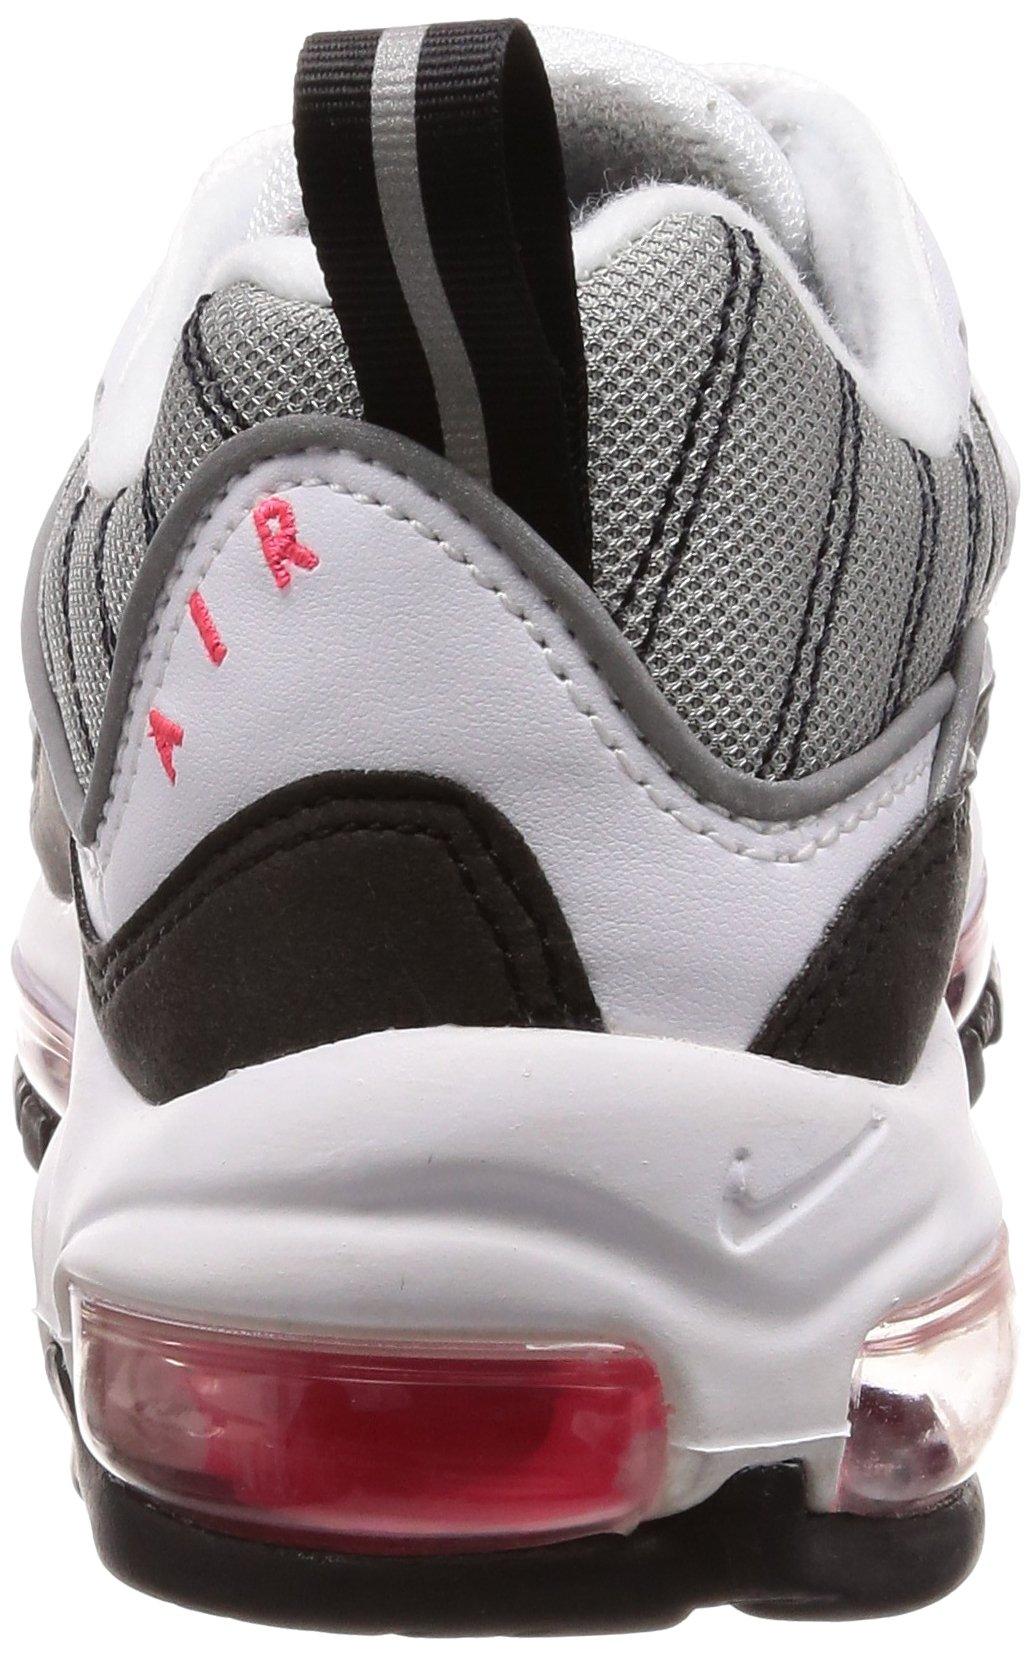 Nike Women's W Air Max 98 Running Shoes